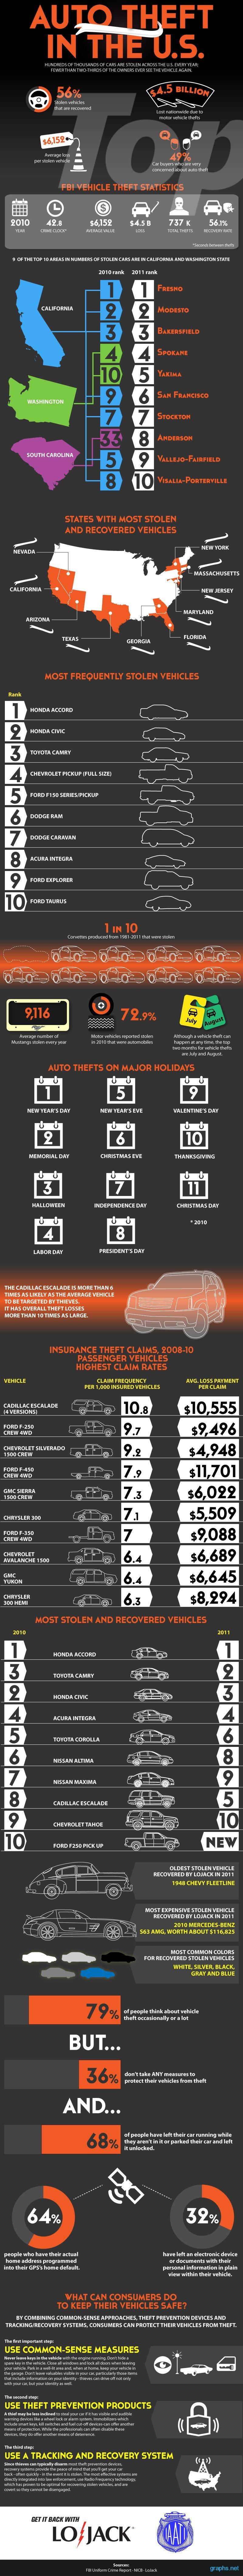 us auto theft statistics